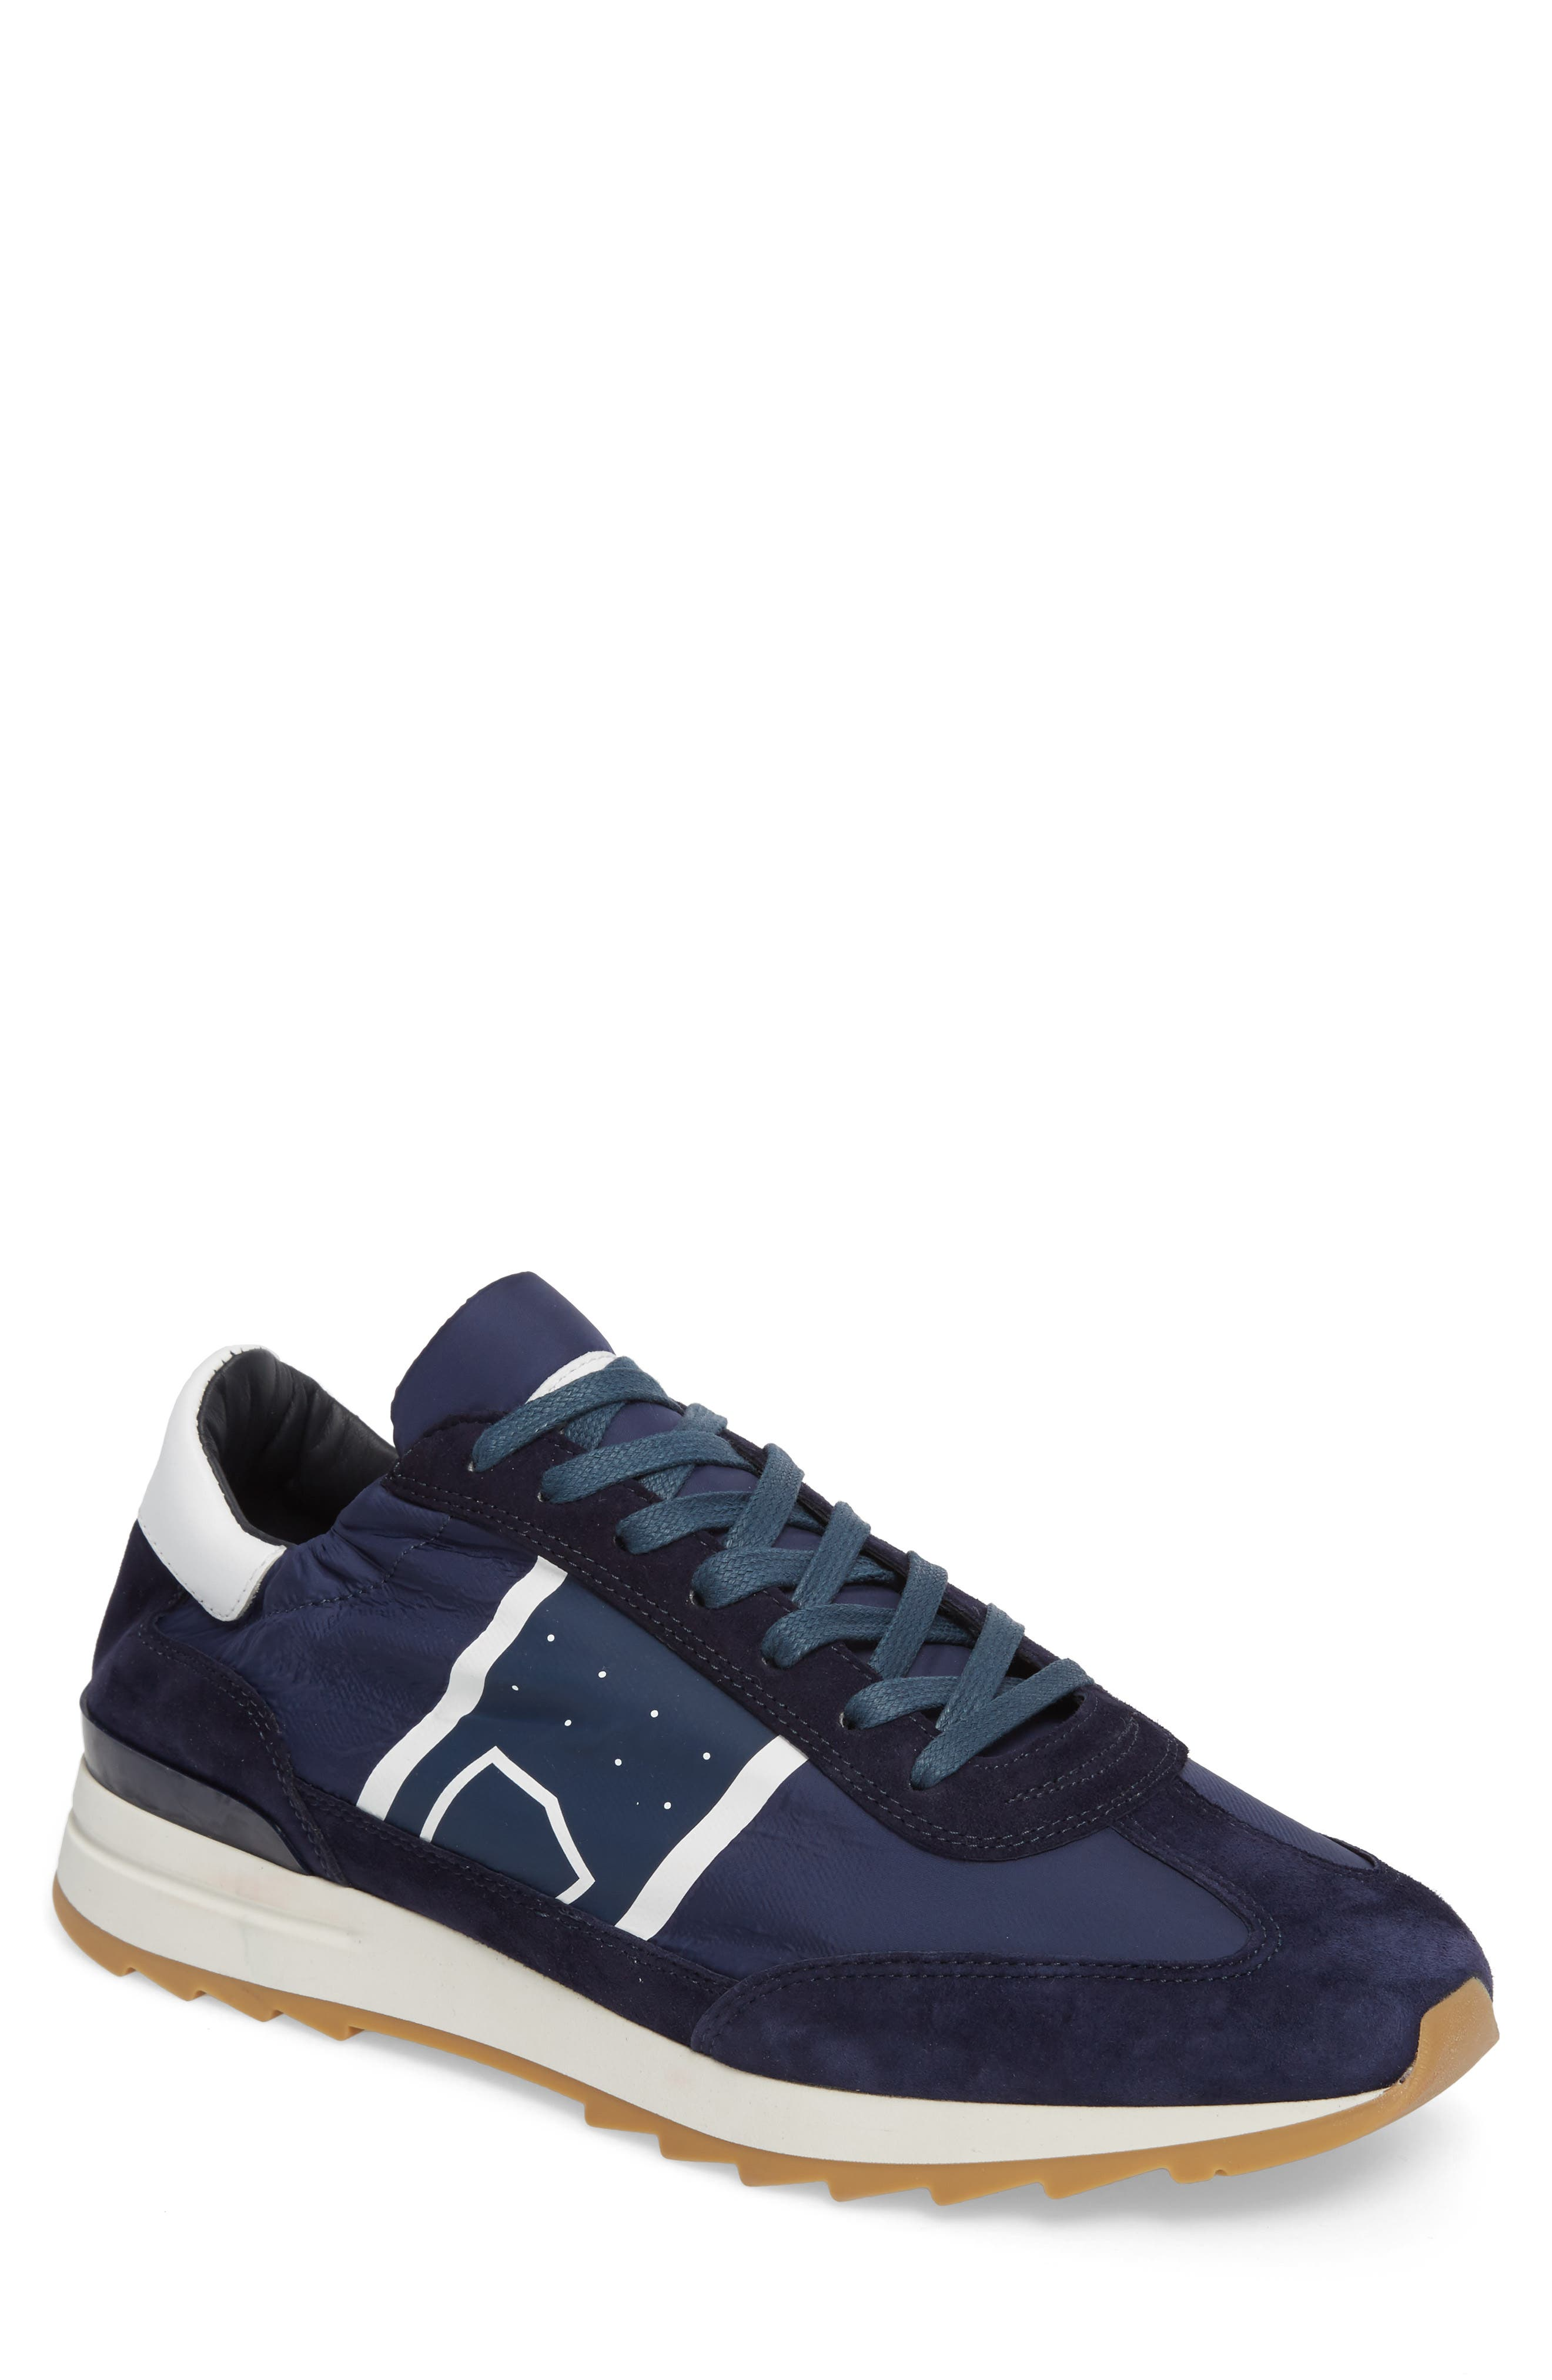 Toujours Sneaker,                             Main thumbnail 1, color,                             Blue/ Blue